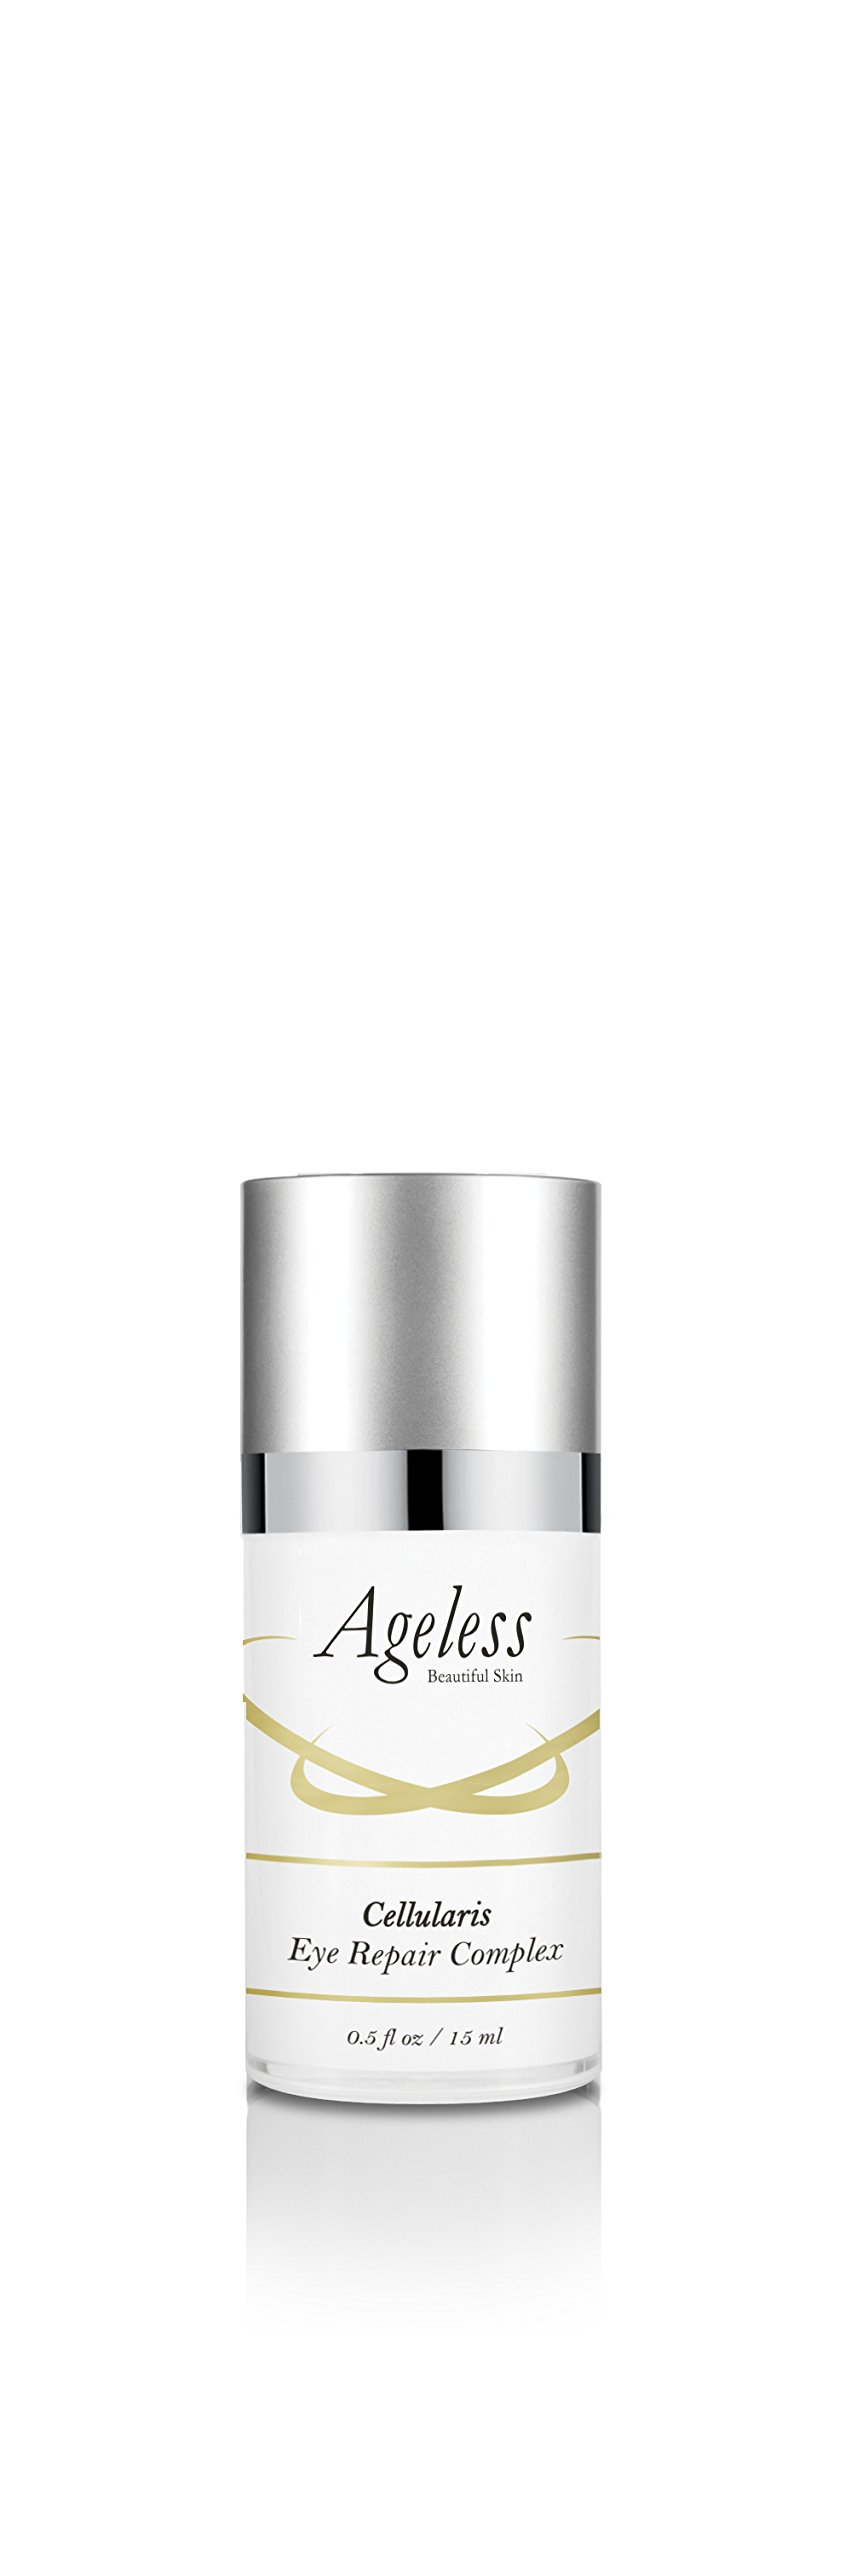 Ageless Beautiful Skin Cellularis Eye Repair Complex 0.5 fl oz / 15 ml - Anti-Aging Cream - Hydrating and Nourishing Peptide Solution